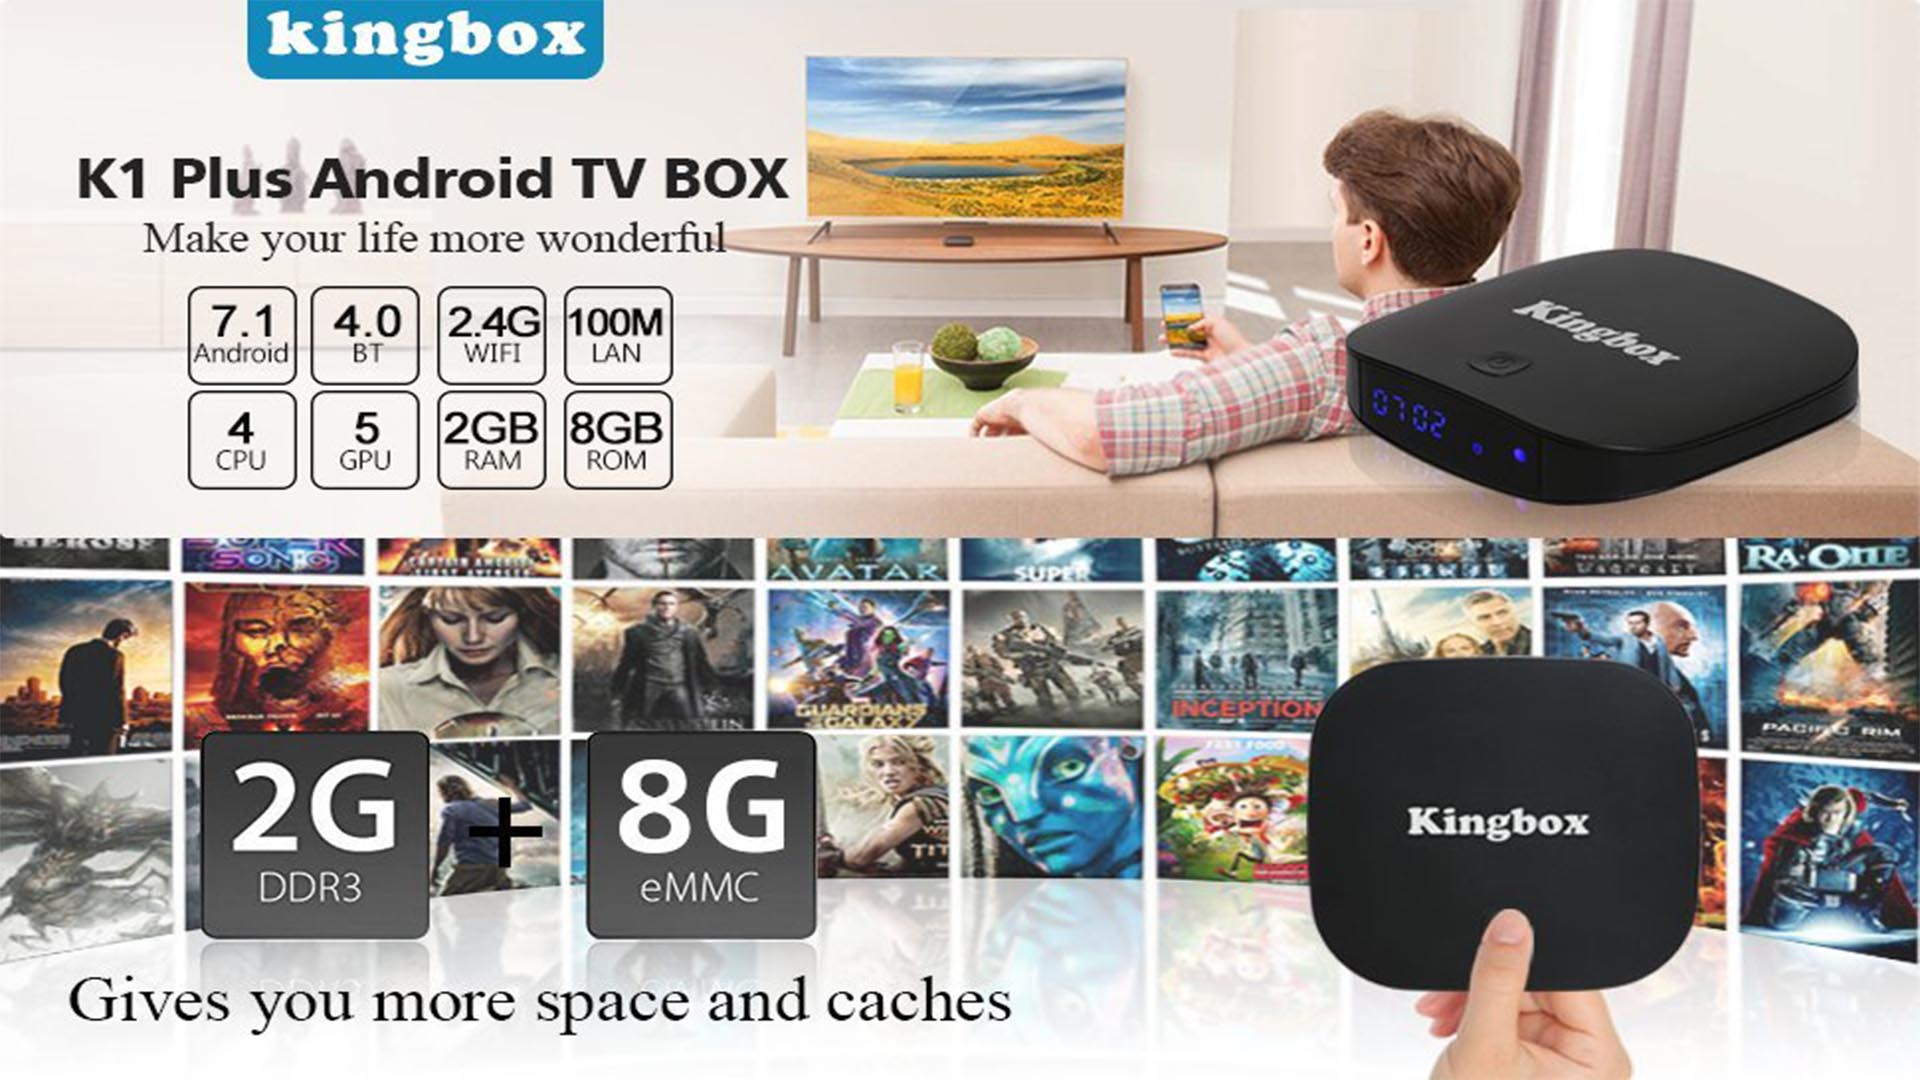 Kingbox K1 Plus